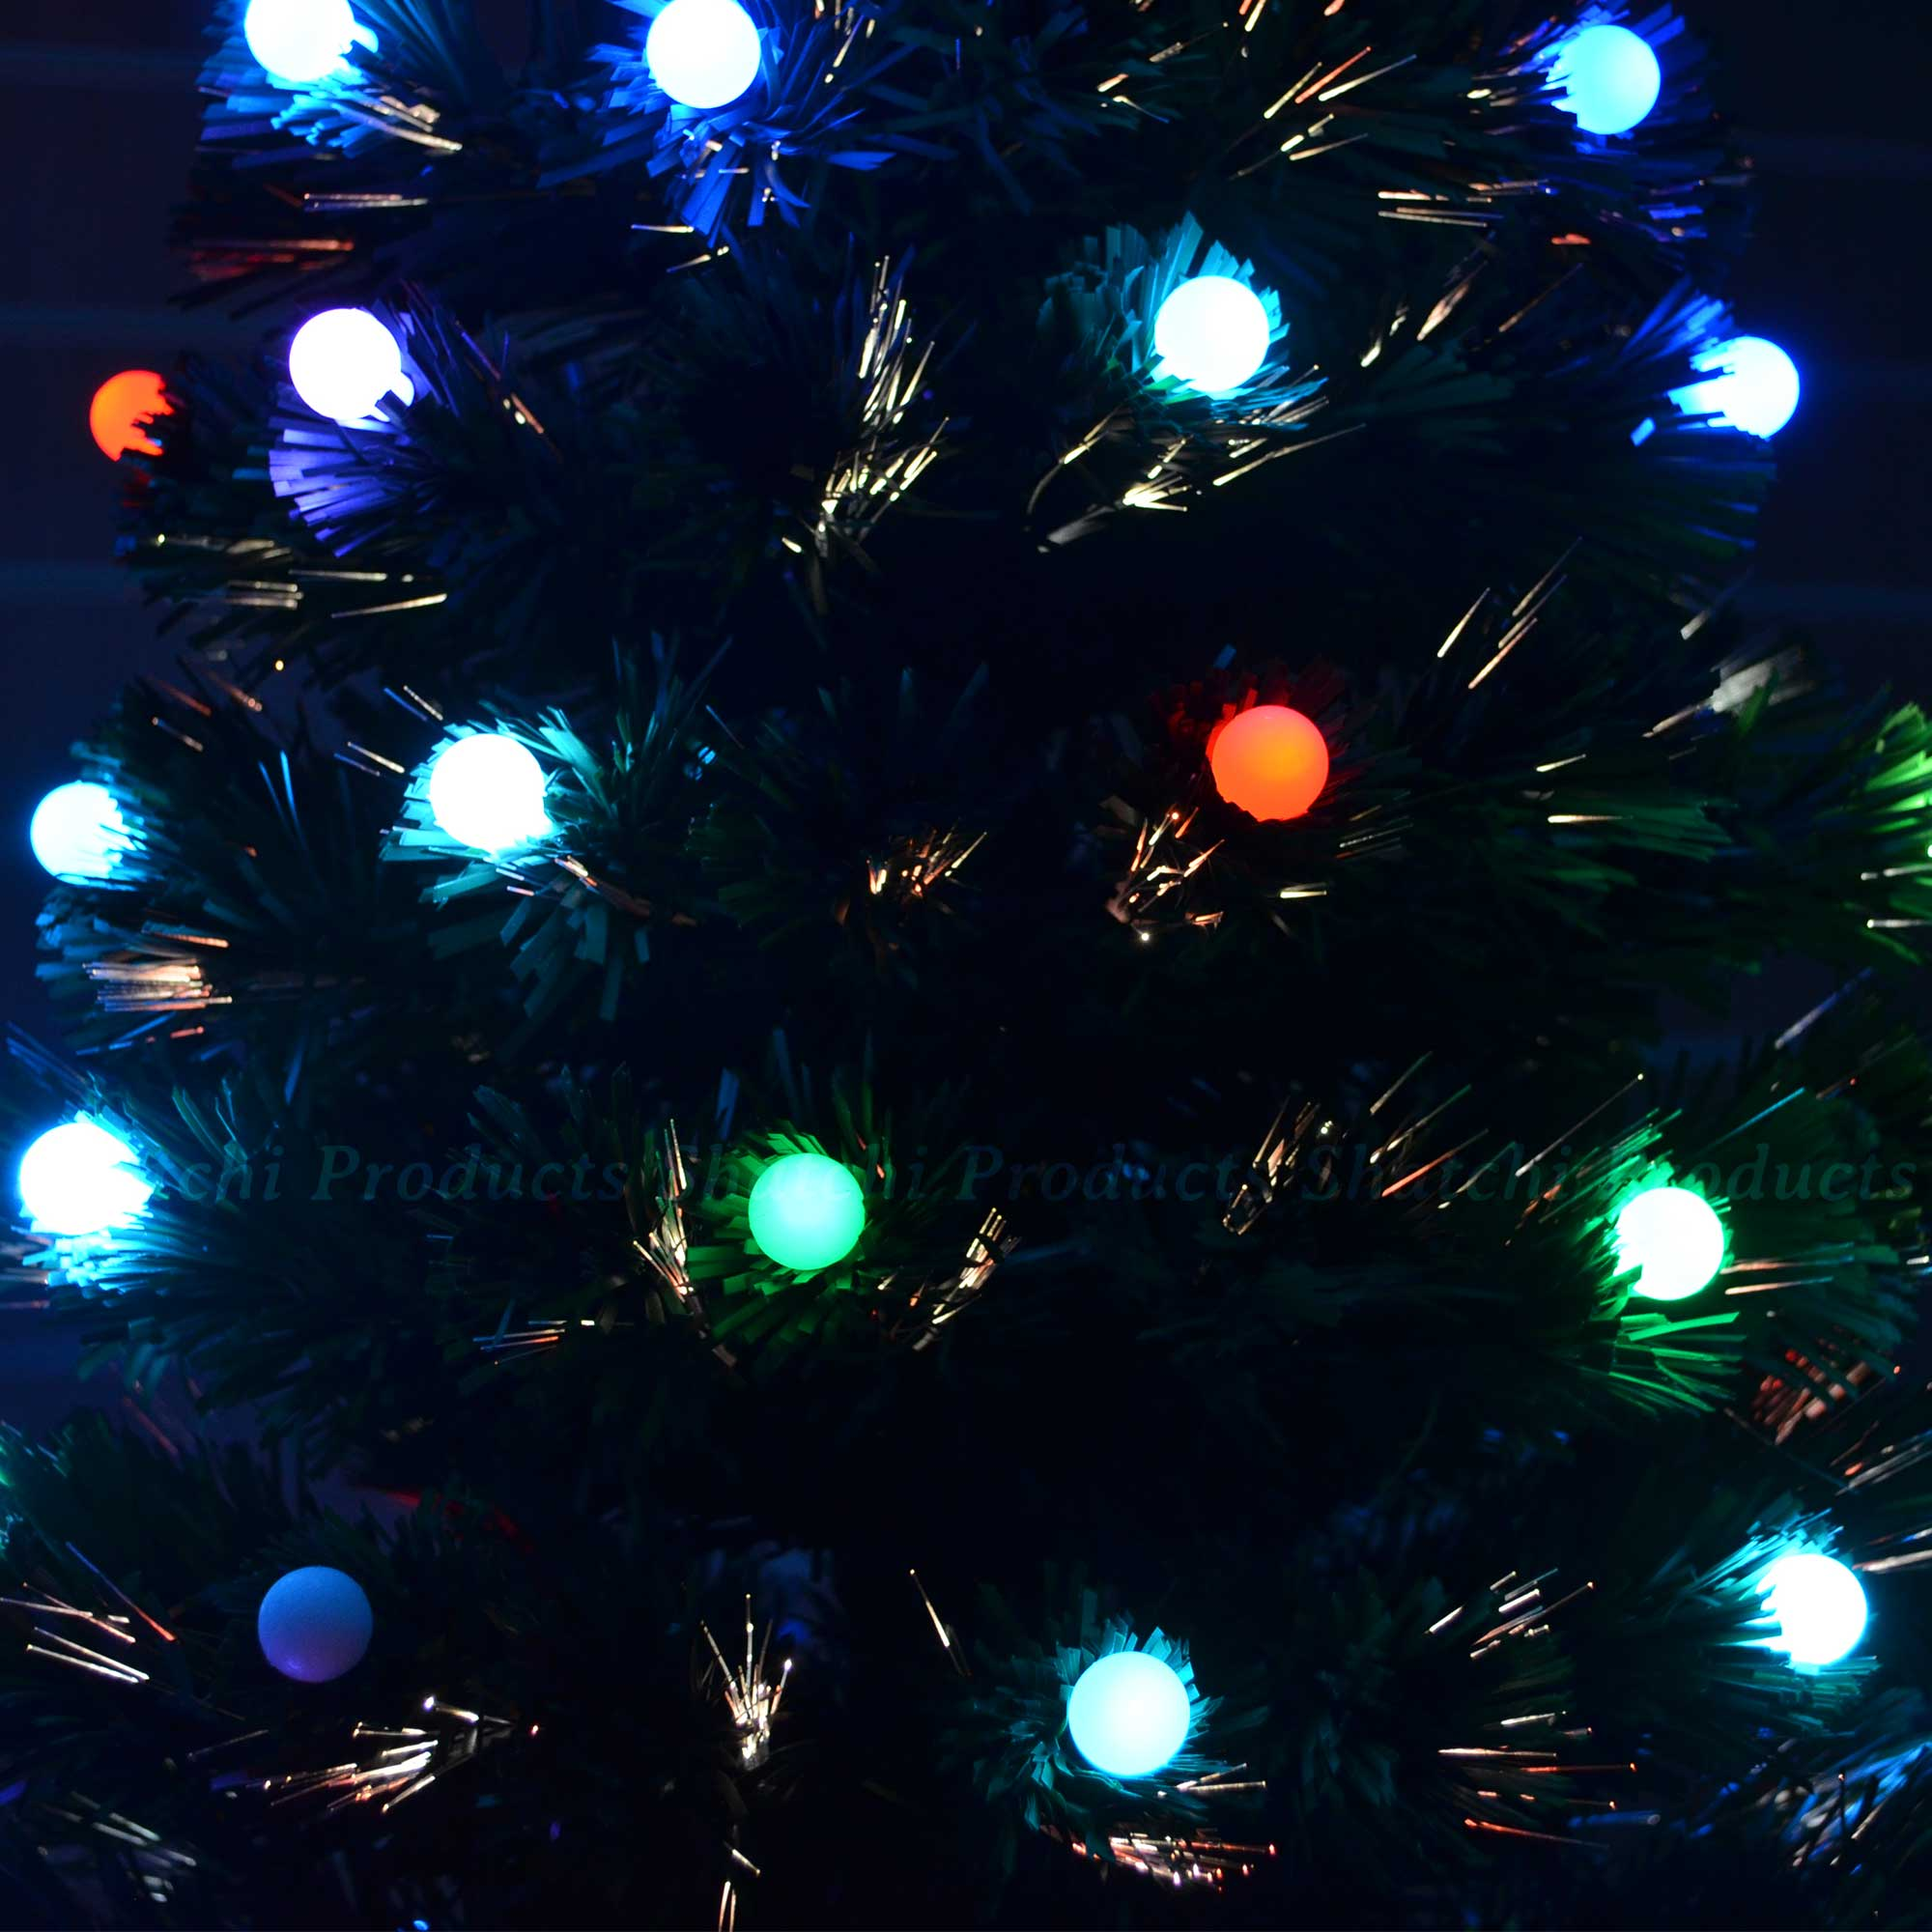 4ft Christmas Tree With Lights: 2ft, 3ft, 4ft, 5ft, 6ft Fibre Optic LED Christmas Tree Pre